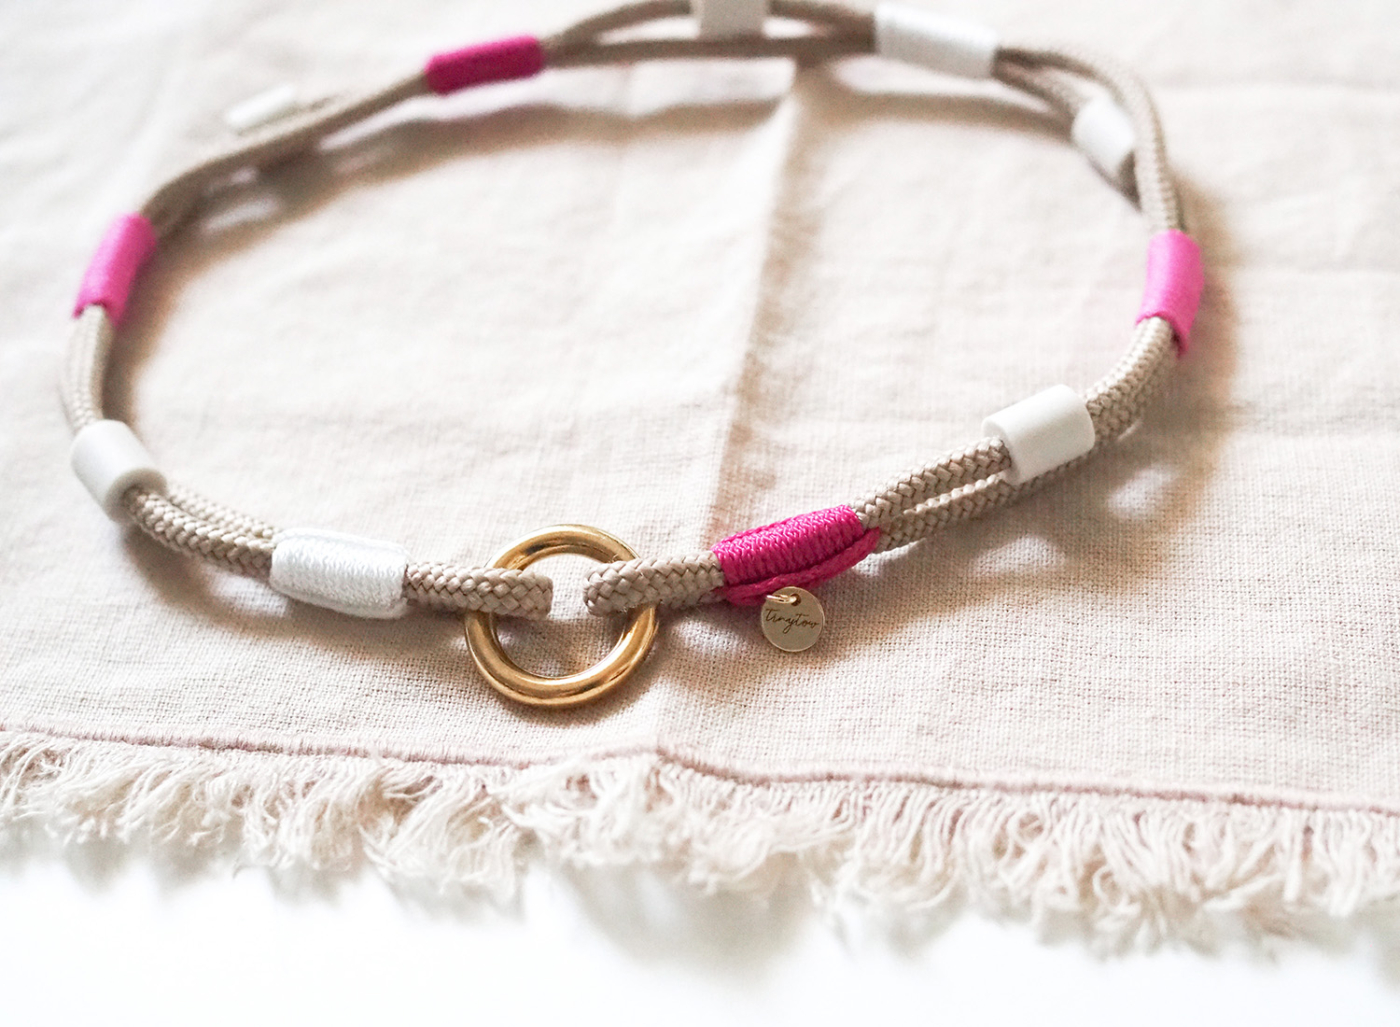 Anti-Zeckenband/EM-Keramik Band aus Tau in beige und pink.